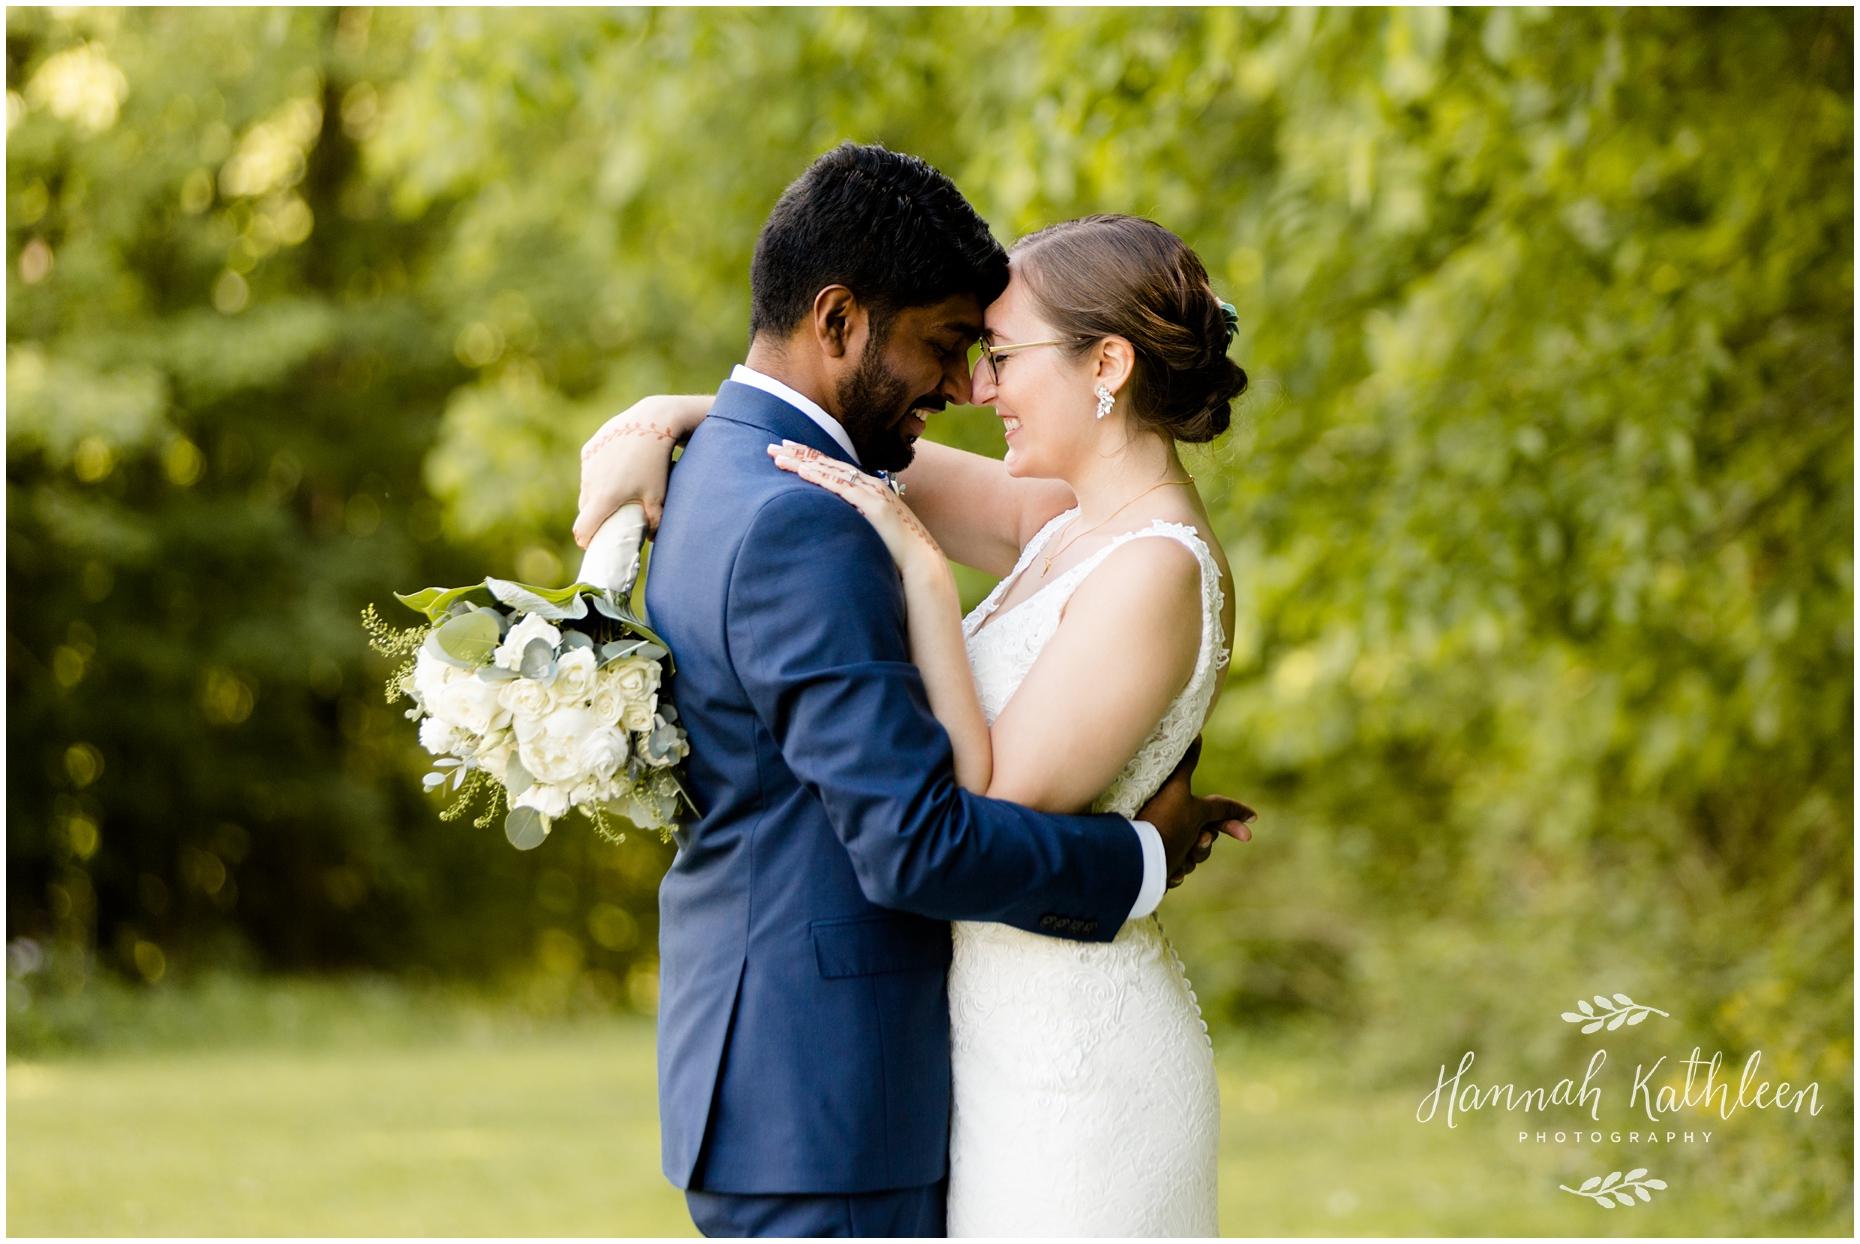 Aneeth_Jessica_Small_Elopement_Wedding_Photography_Buffalo_NY